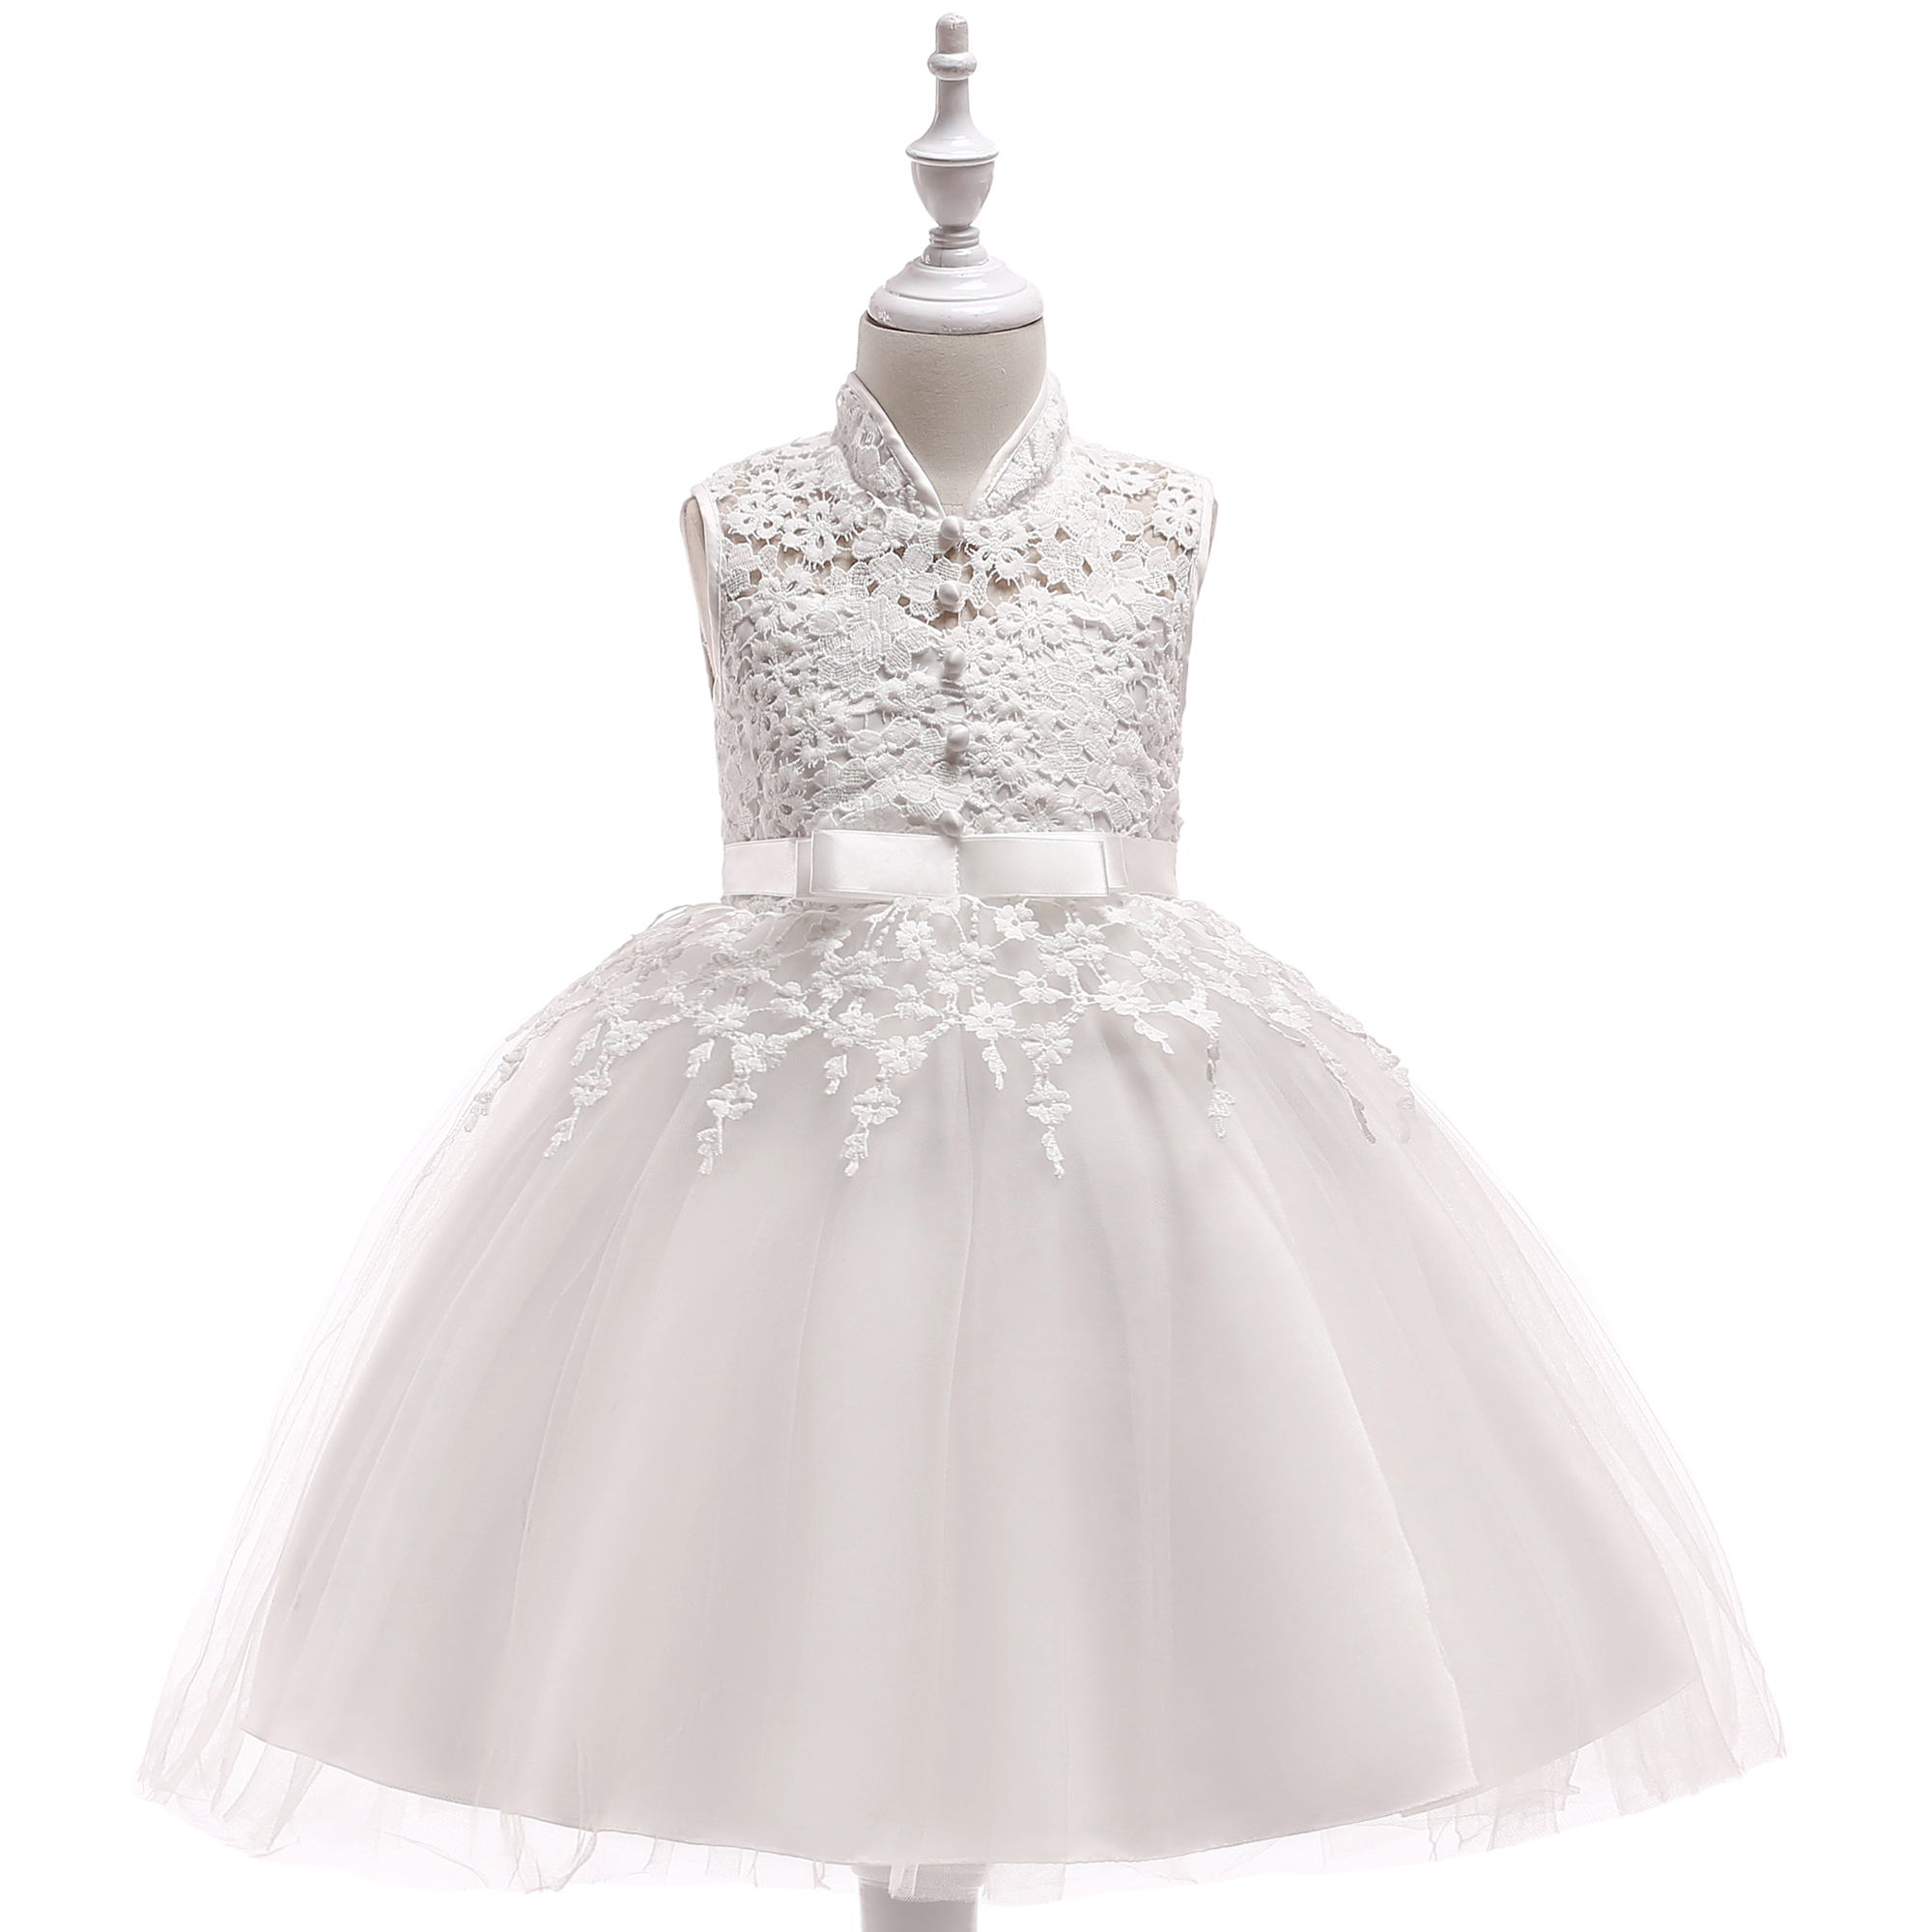 2b93886bf Best Seller Girl Princess Hollow Party Dress Kids Prom Wedding Mini Frock  Children Garments L5021 - Buy Girl Princess Hollow Party Dress,Kids Prom  Wedding ...